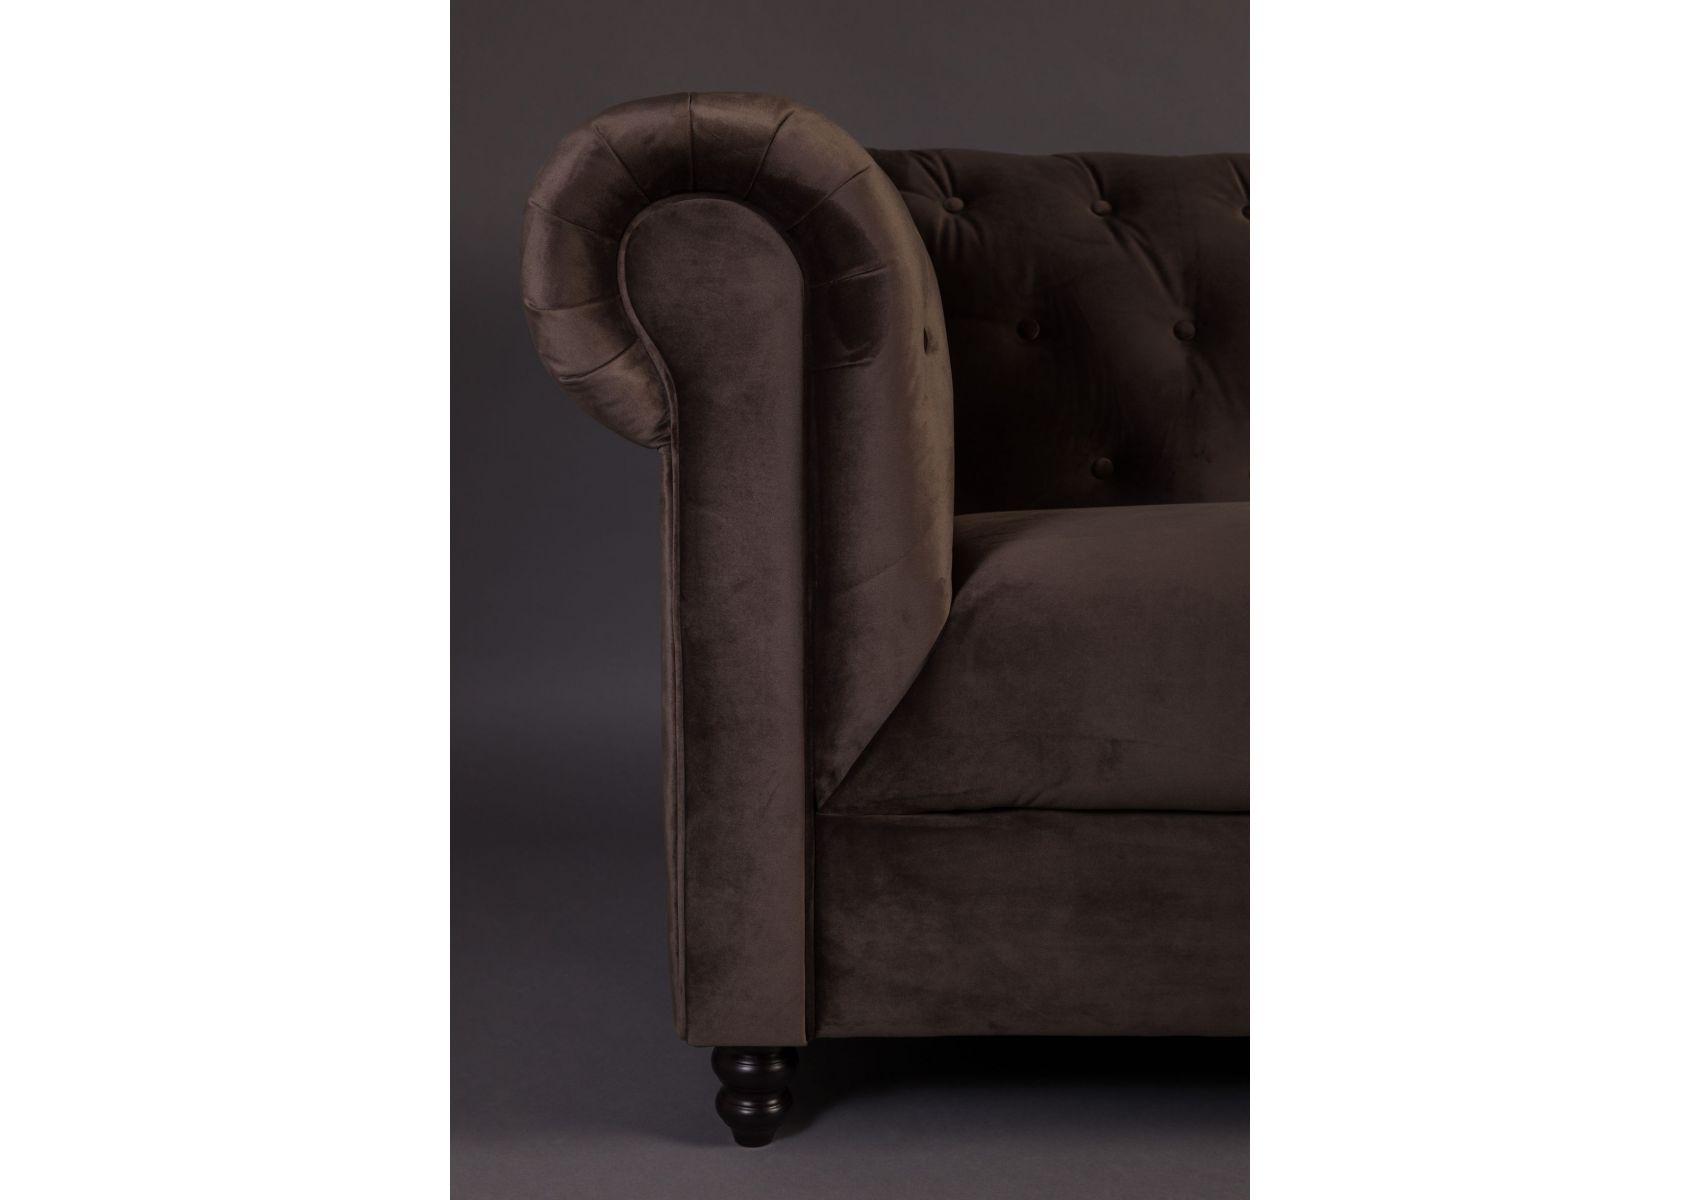 canap design en tissu de la collection chesterfield de chez dutch bone. Black Bedroom Furniture Sets. Home Design Ideas